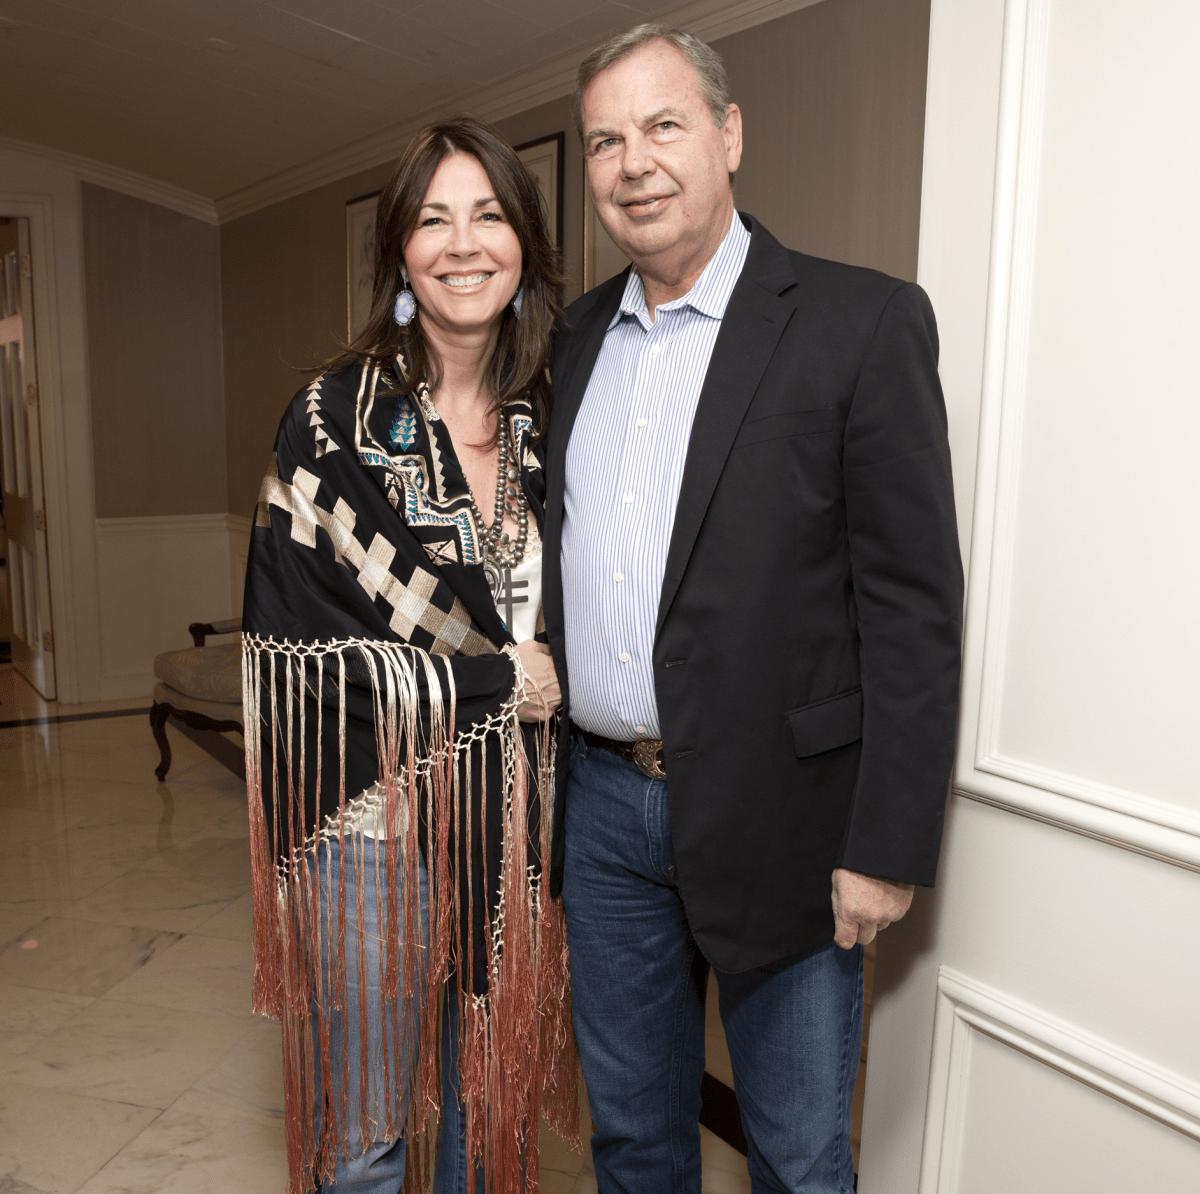 Houston, Blue Bird Circle Gala with Lyle Lovett, April 2017, Kathy Oliver, Brian Chandler